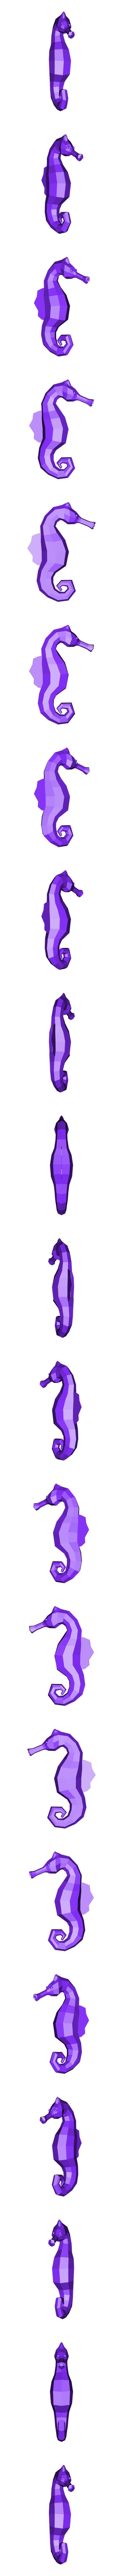 seahorse.obj Download free OBJ file Seahorse • 3D printer design, Colorful3D